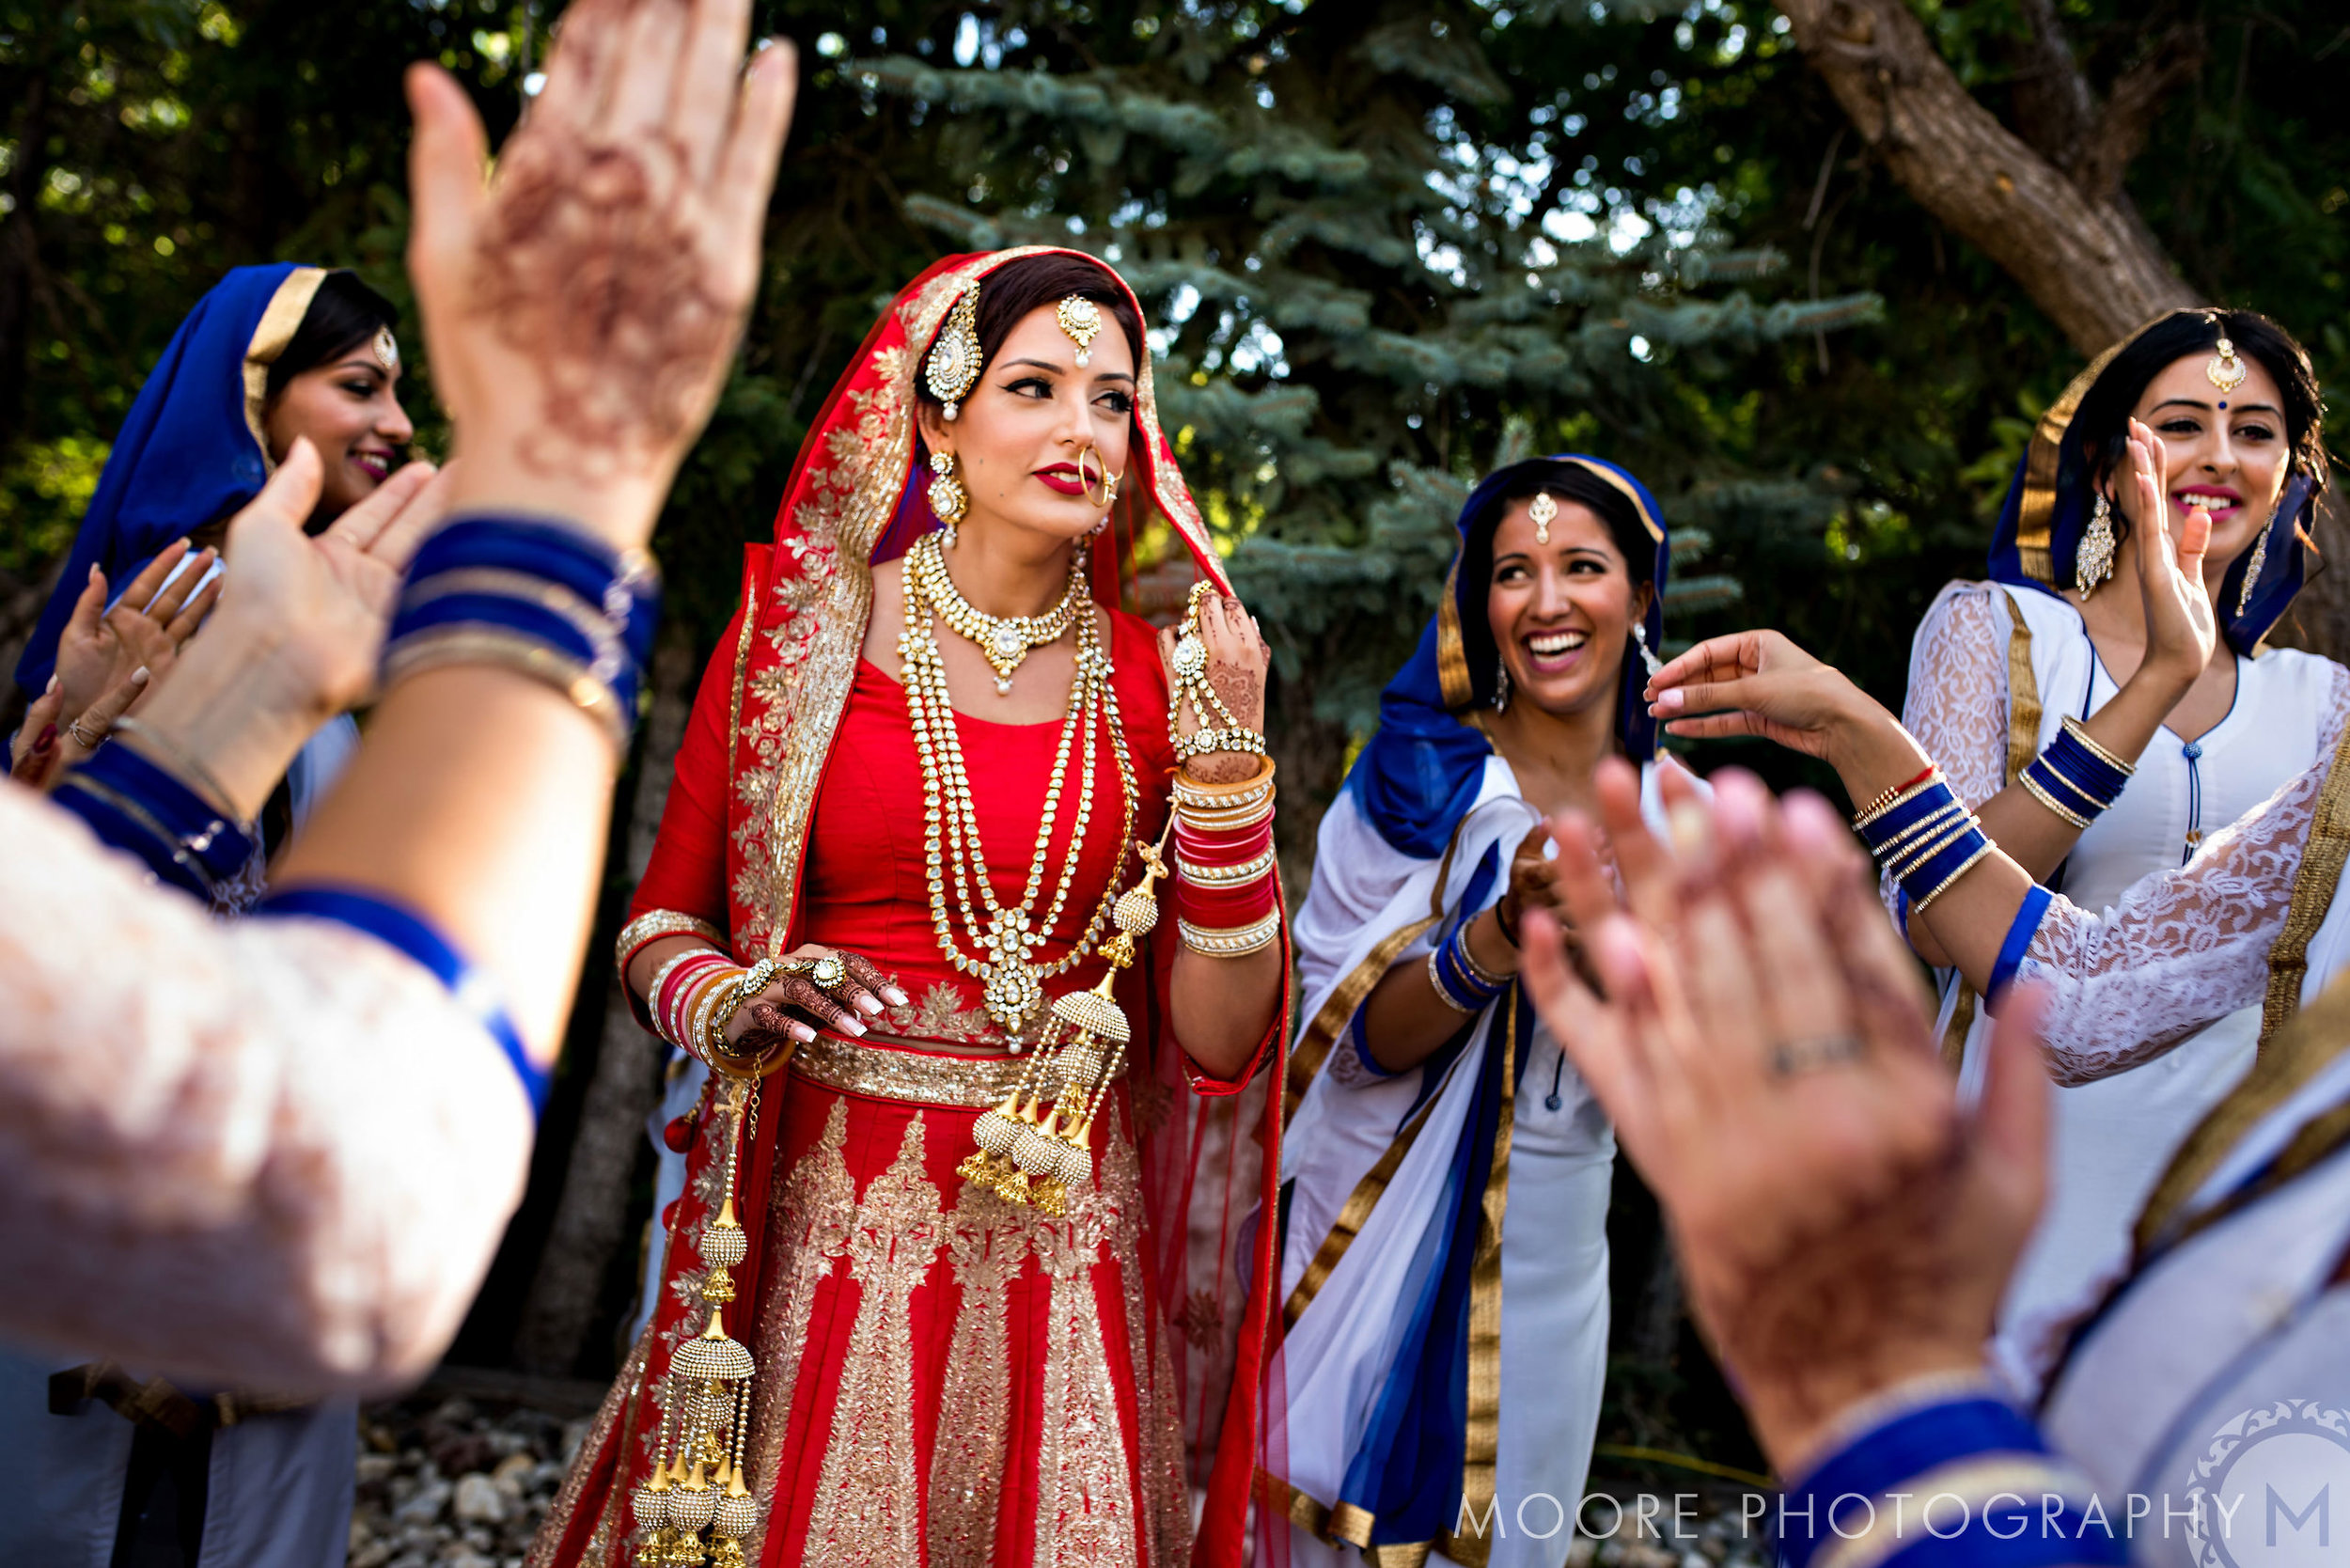 Toronto Makeup Artist, Toronto Wedding makeup artist, Markham Makeup Artist, Sikh Wedding Makeup Artist, indian wedding makeup artist toronto, sikh wedding makeup artist toronto, toronto punjabi wedding - cover.jpg